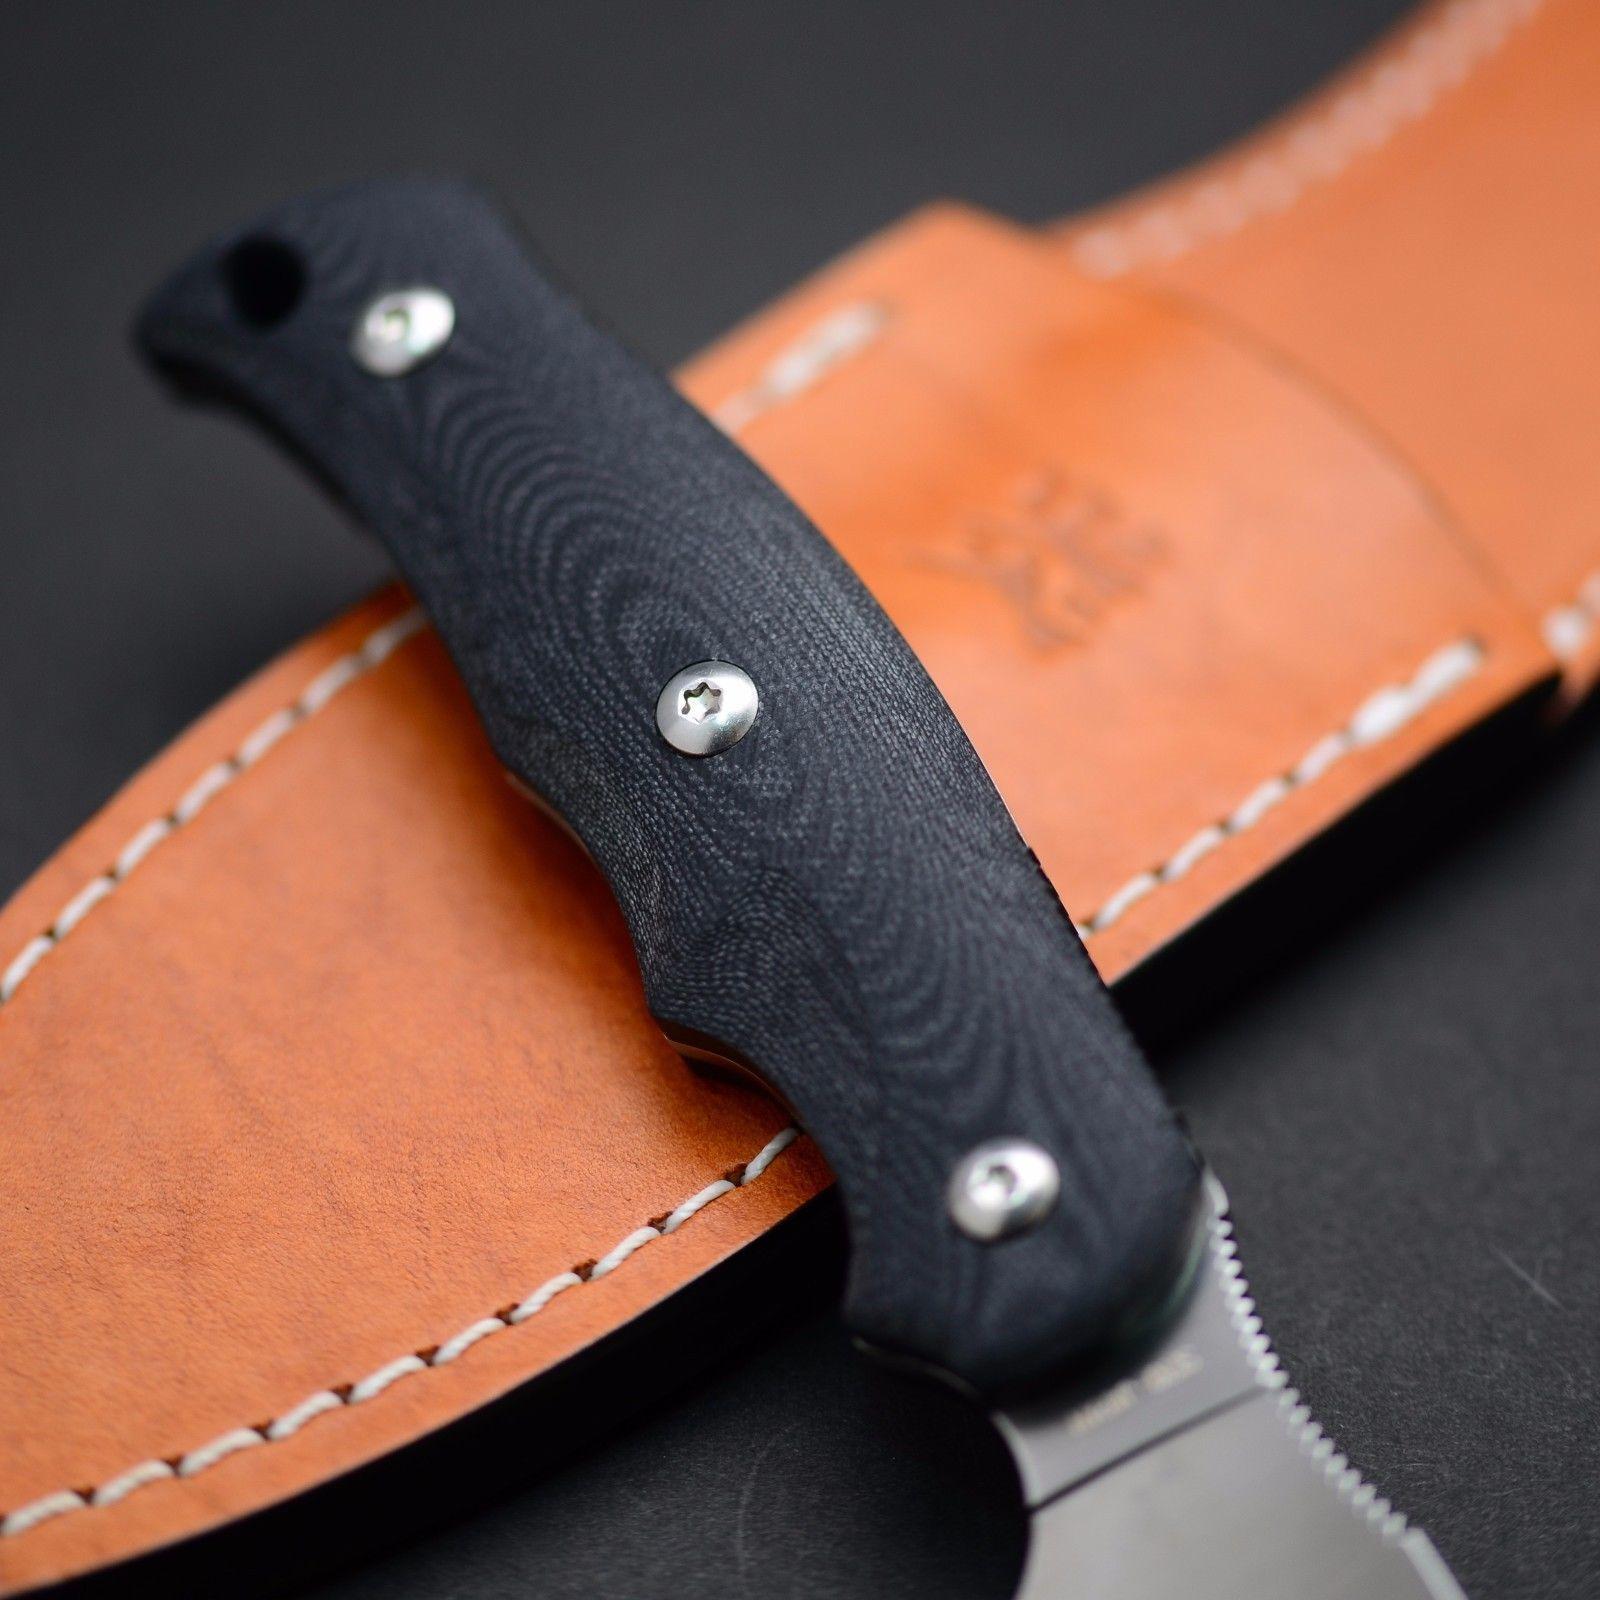 Фото 2 - Туристический нож G.Sakai, Camper En Fixed, ZDP-189, Black G-10